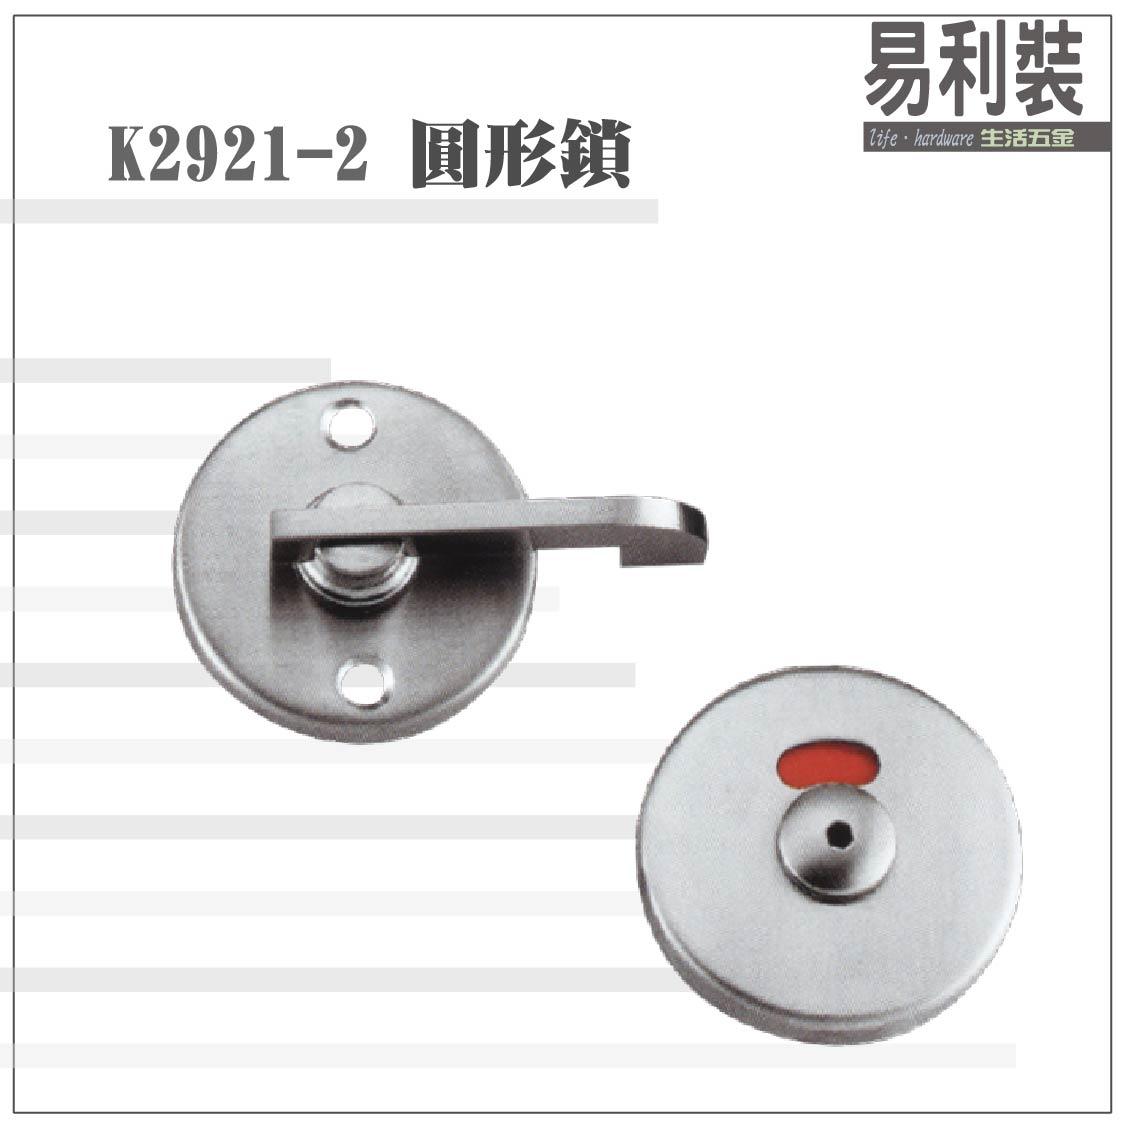 【 EASYCAN  】K2921-2 不鏽鋼圓形鎖  易利裝生活五金 浴室 廚房 房間 臥房 衣櫃 小資族 辦公家具 系統家具 0